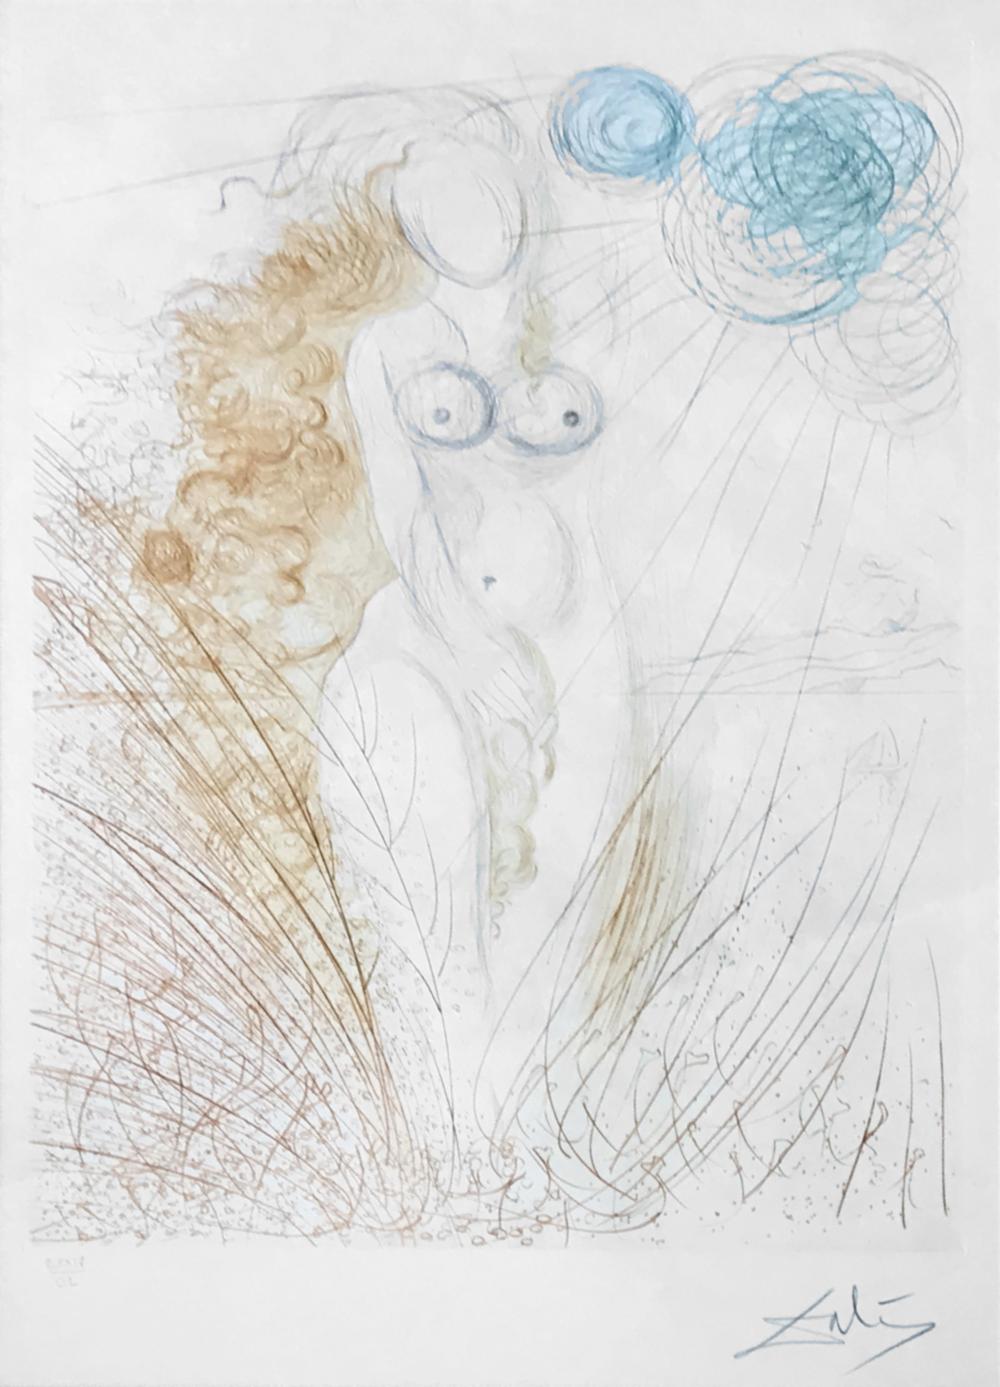 SALVADOR DALÍ   La Naissance de Venus  [ The Birth of Venus ], 1971  Original etching in black ink with stencil colours on BFK Rives watermarked paper, 75.7 x 56.5 cm. Épreuve d'artiste [EA] Artist Proof  £2,300   enquire >